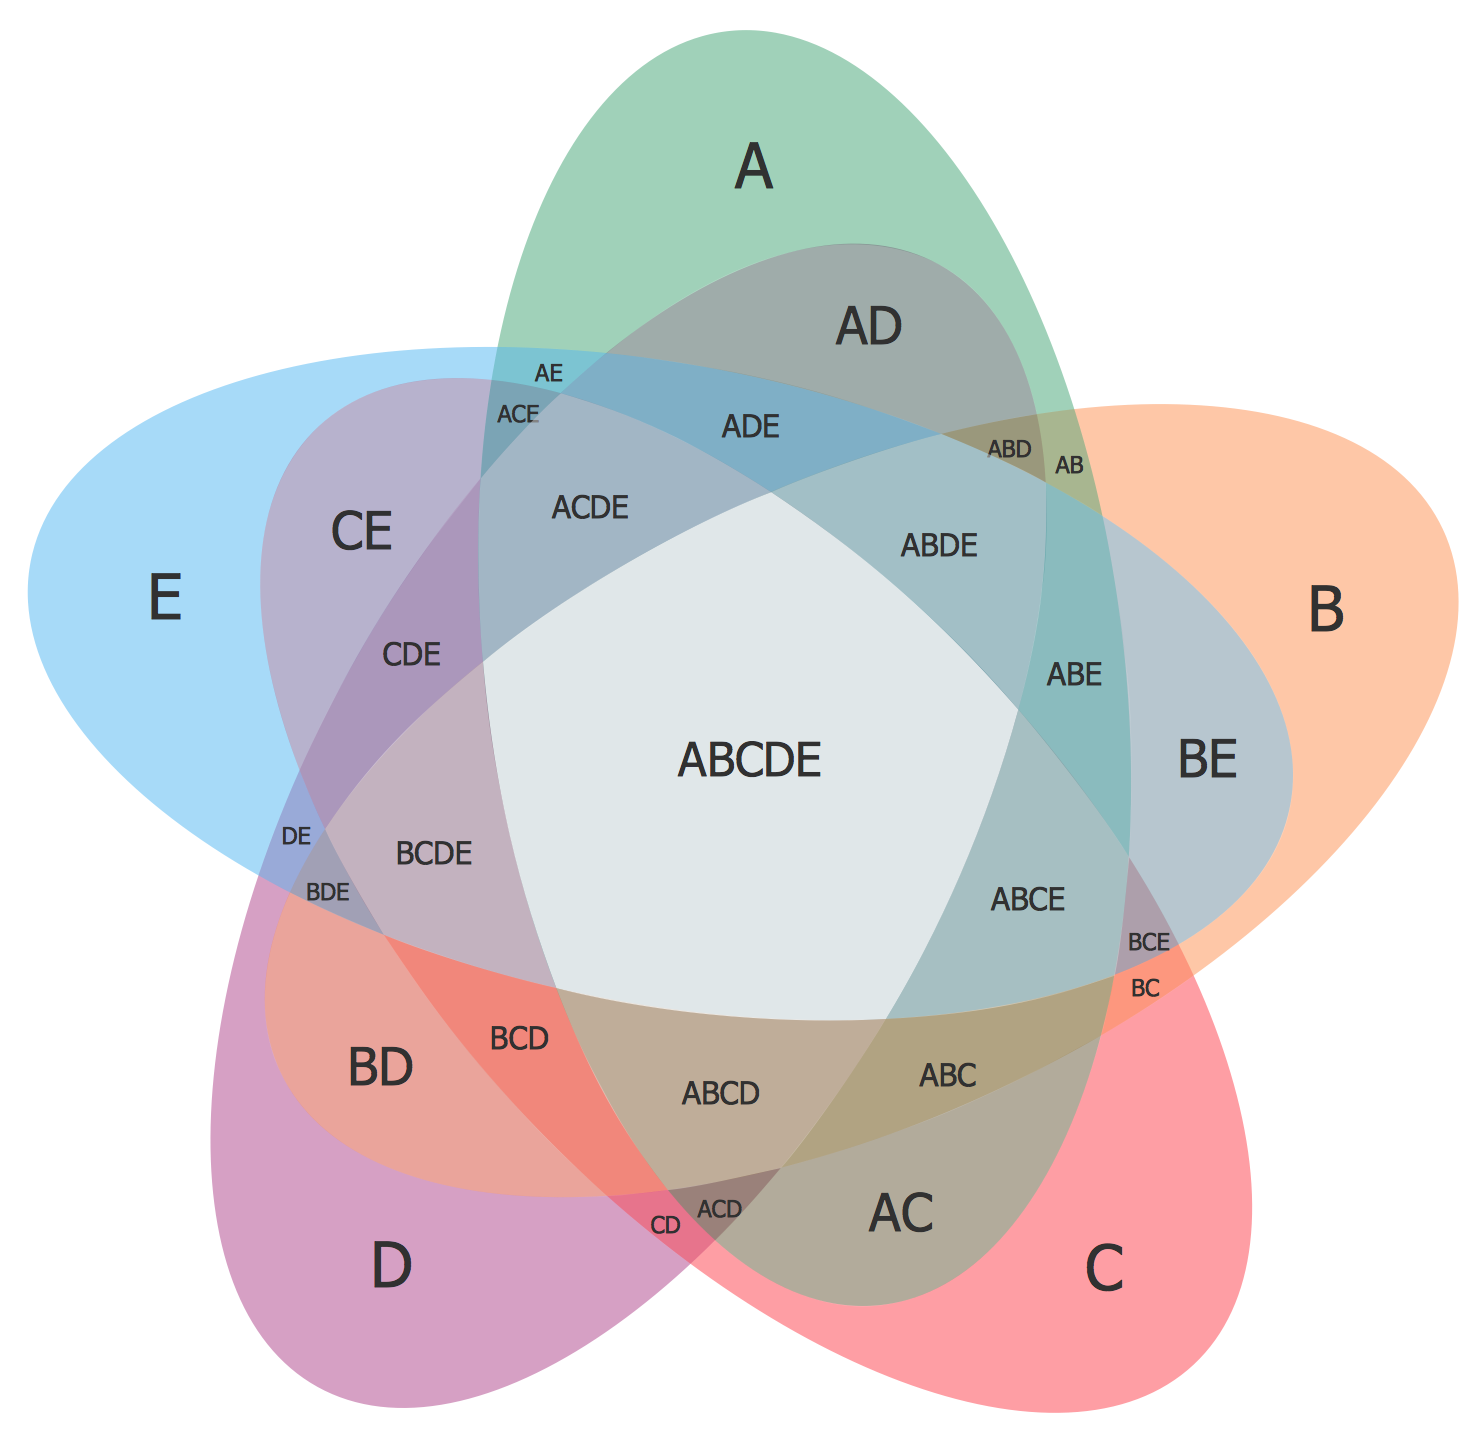 Venn Diagrams Solution | ConceptDraw.com